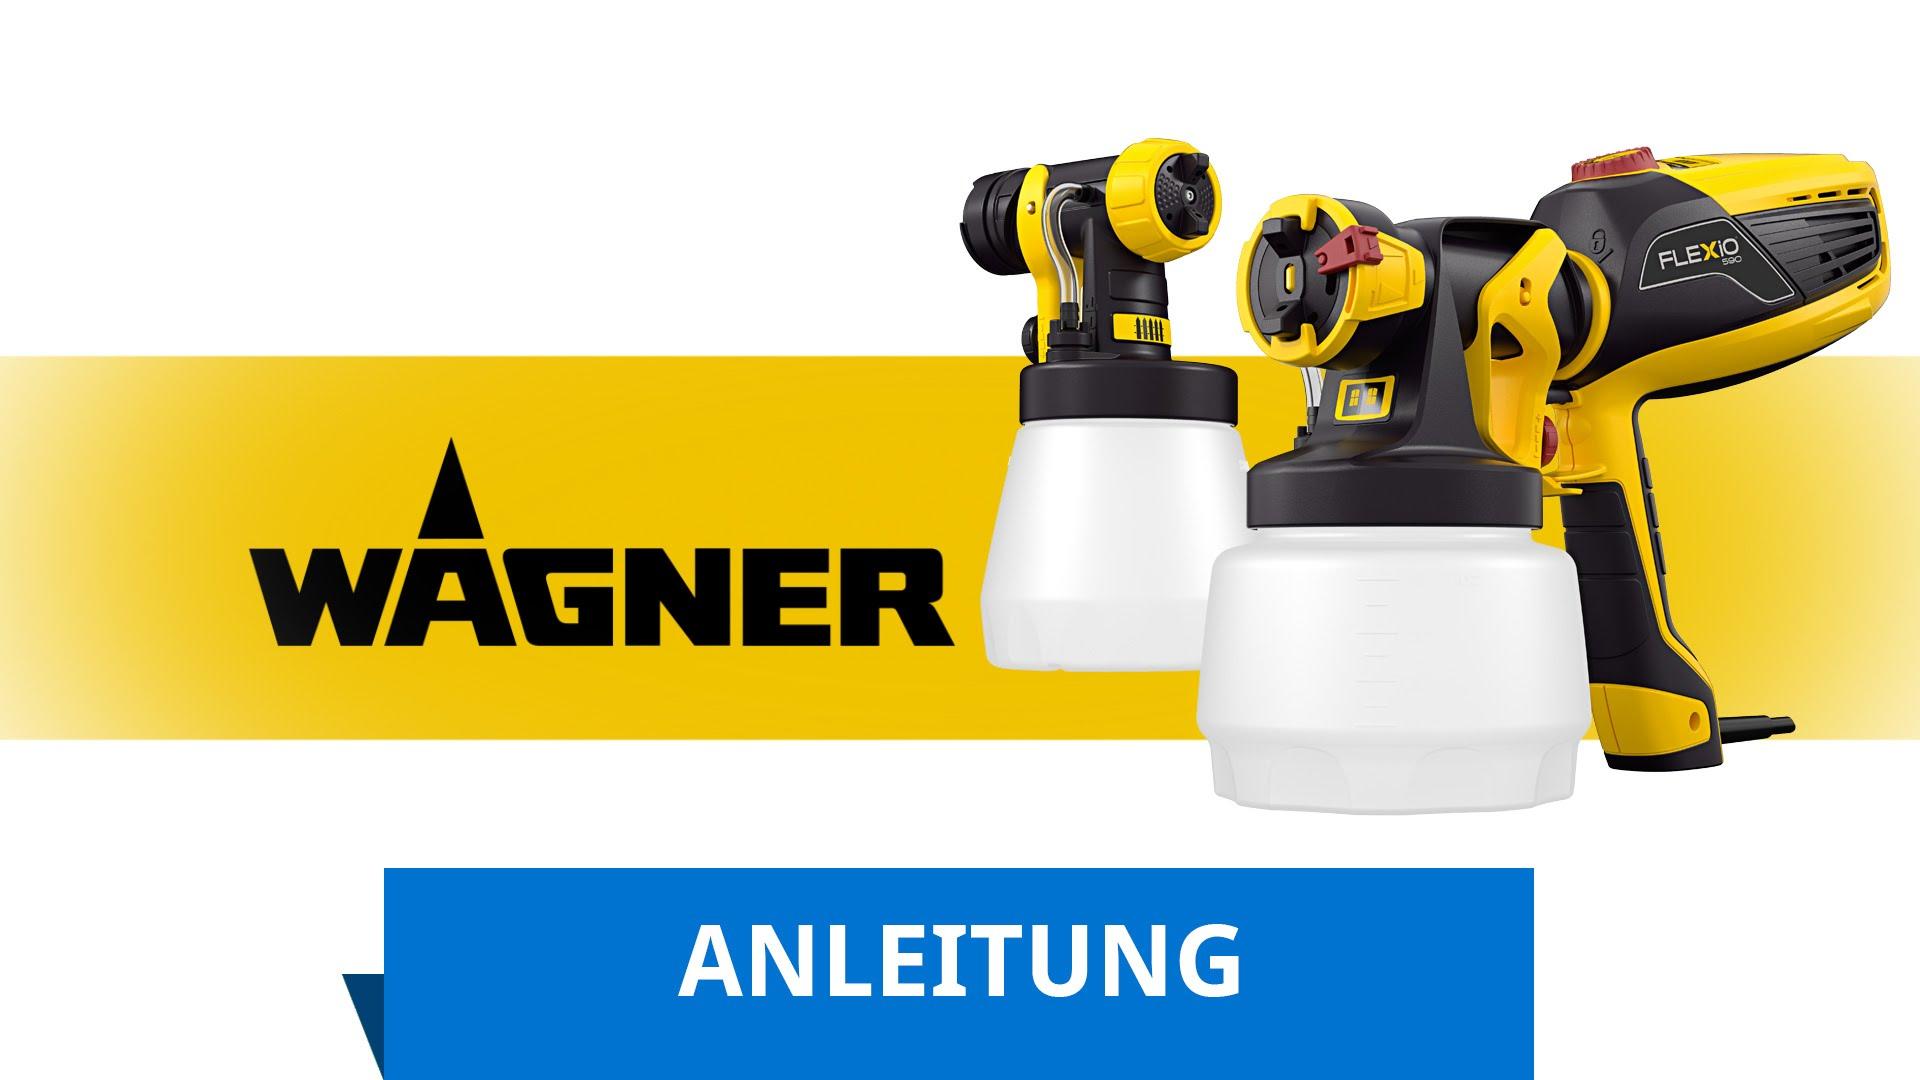 ᐅᐅ】universal sprayer wagner w590 anleitung (tips&tricks)